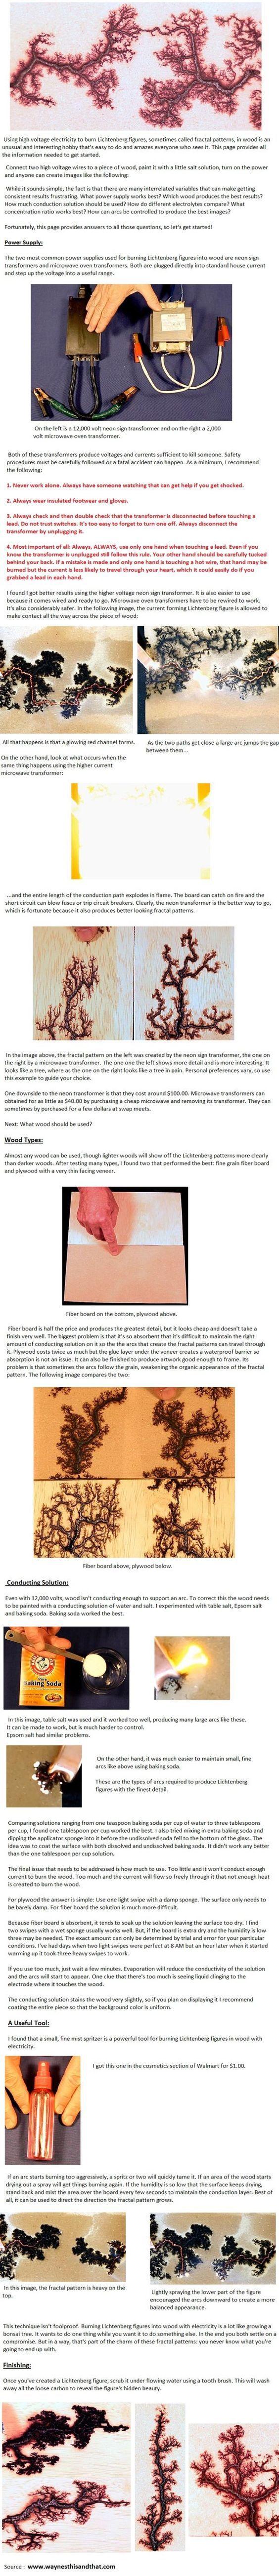 Fractal Lichtenberg Figure Wood Burning With Electricity By waynesthisandthat.com: